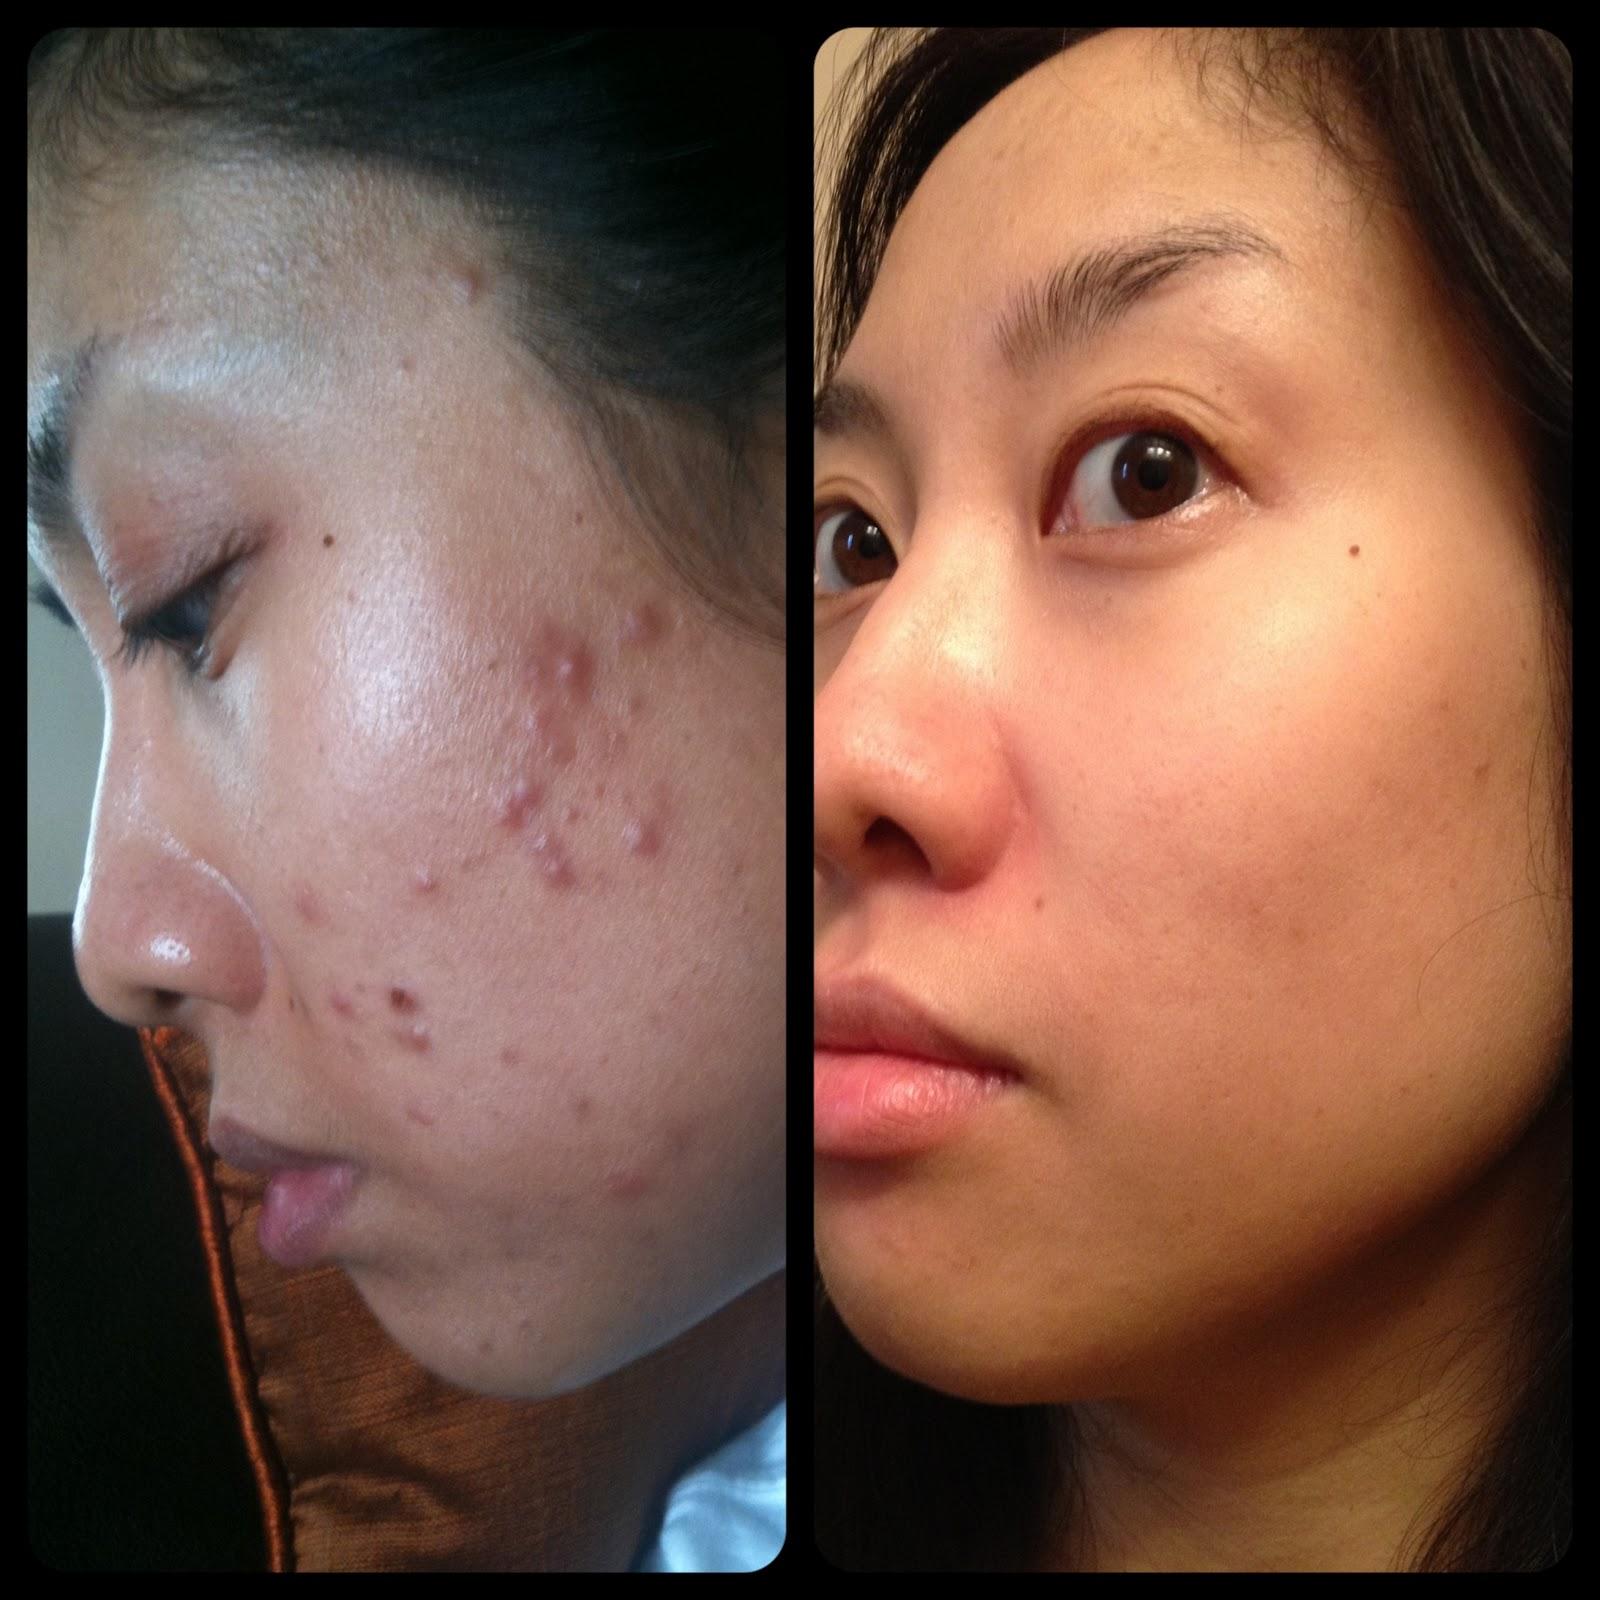 Acne Scar Treatment Chemical Peel Instructions